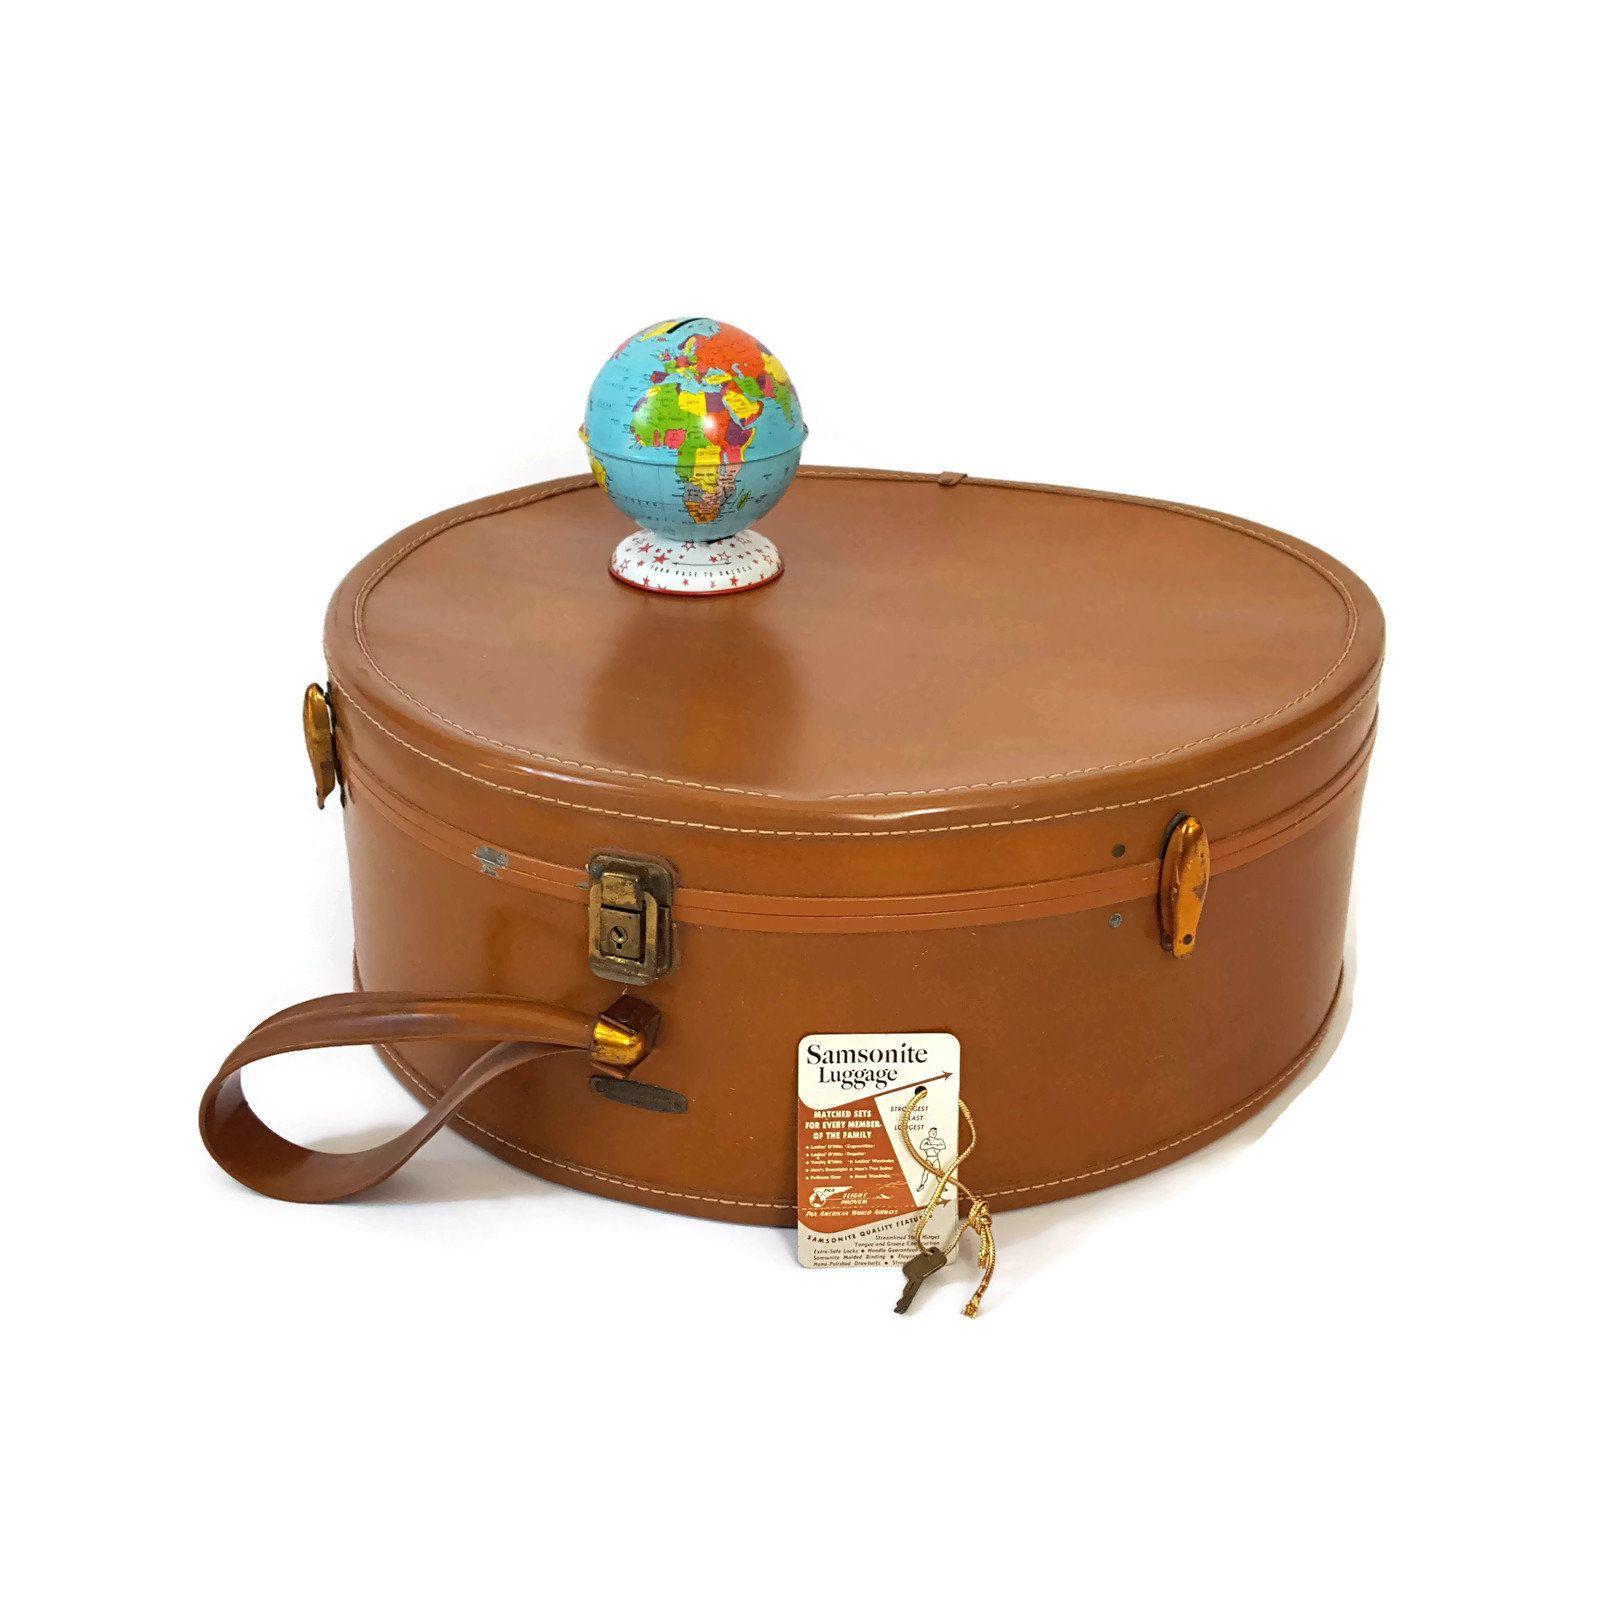 Vintage Samsonite Round Brown Suitcase Retro 1950s Travel Luggage Burlesque Case Hat Box Valise Samsonite Travel Luggage Luggage